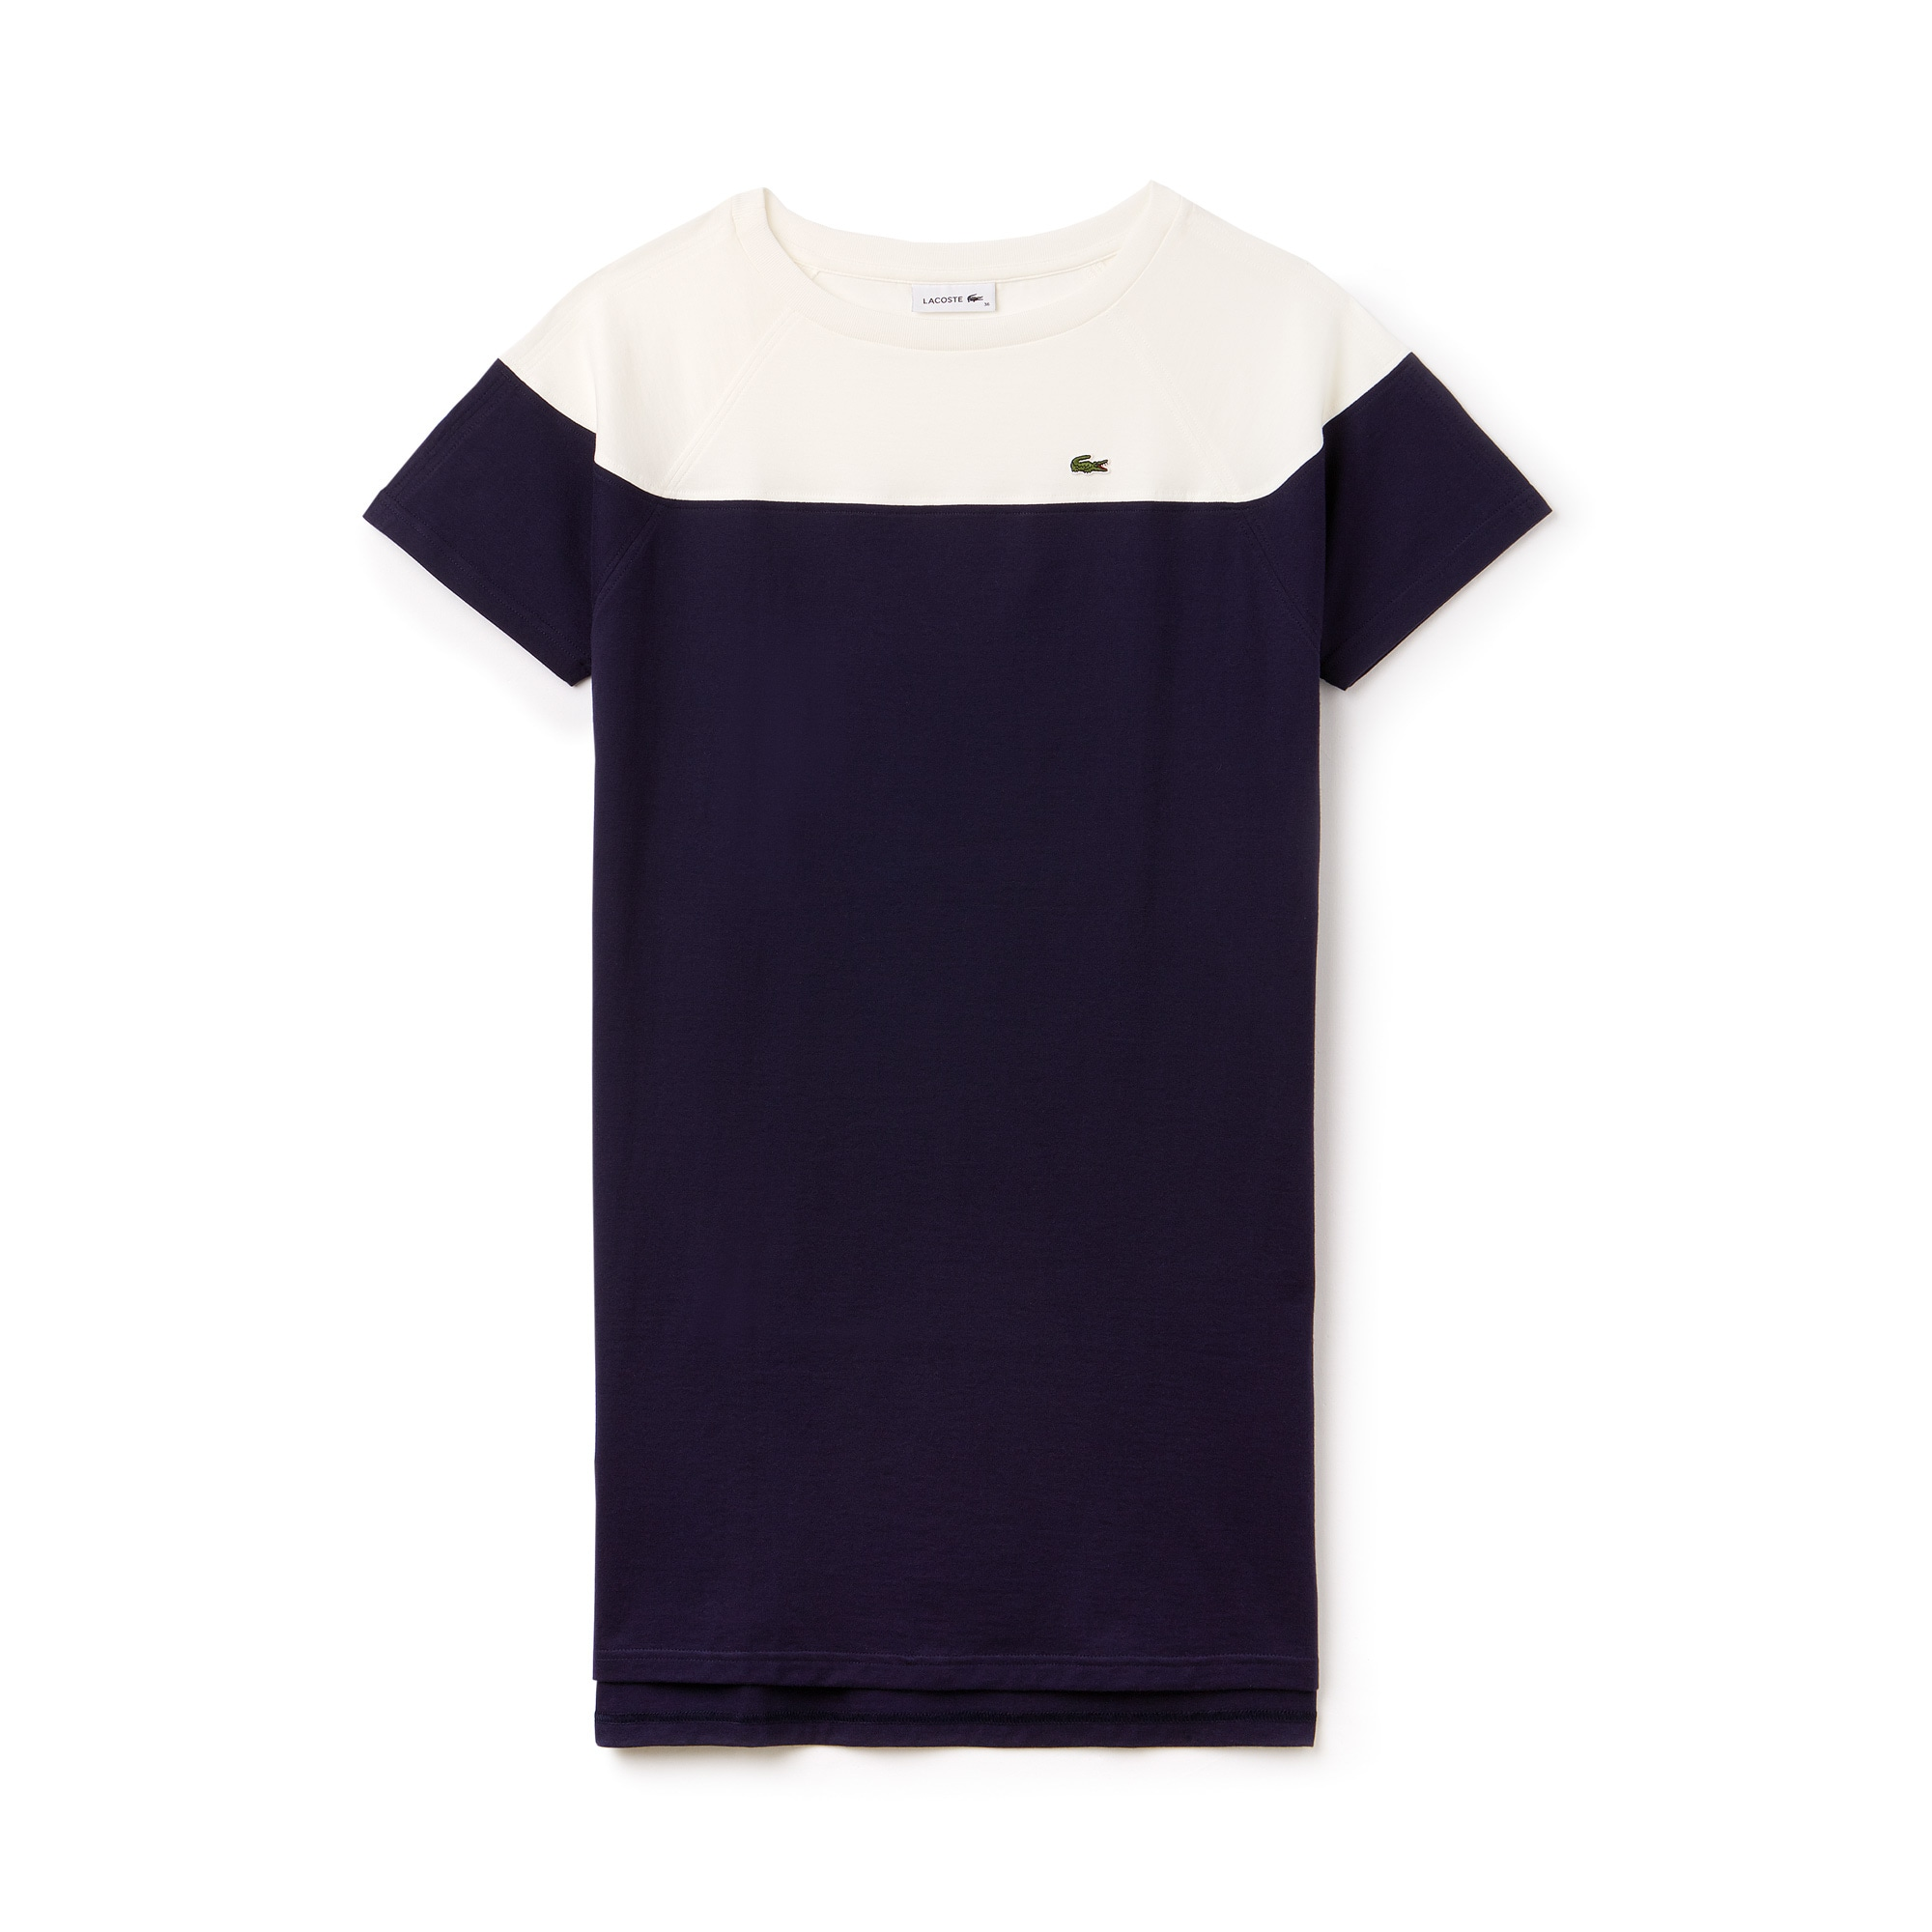 T-shirtjurk dames boothals colorblock katoenjersey